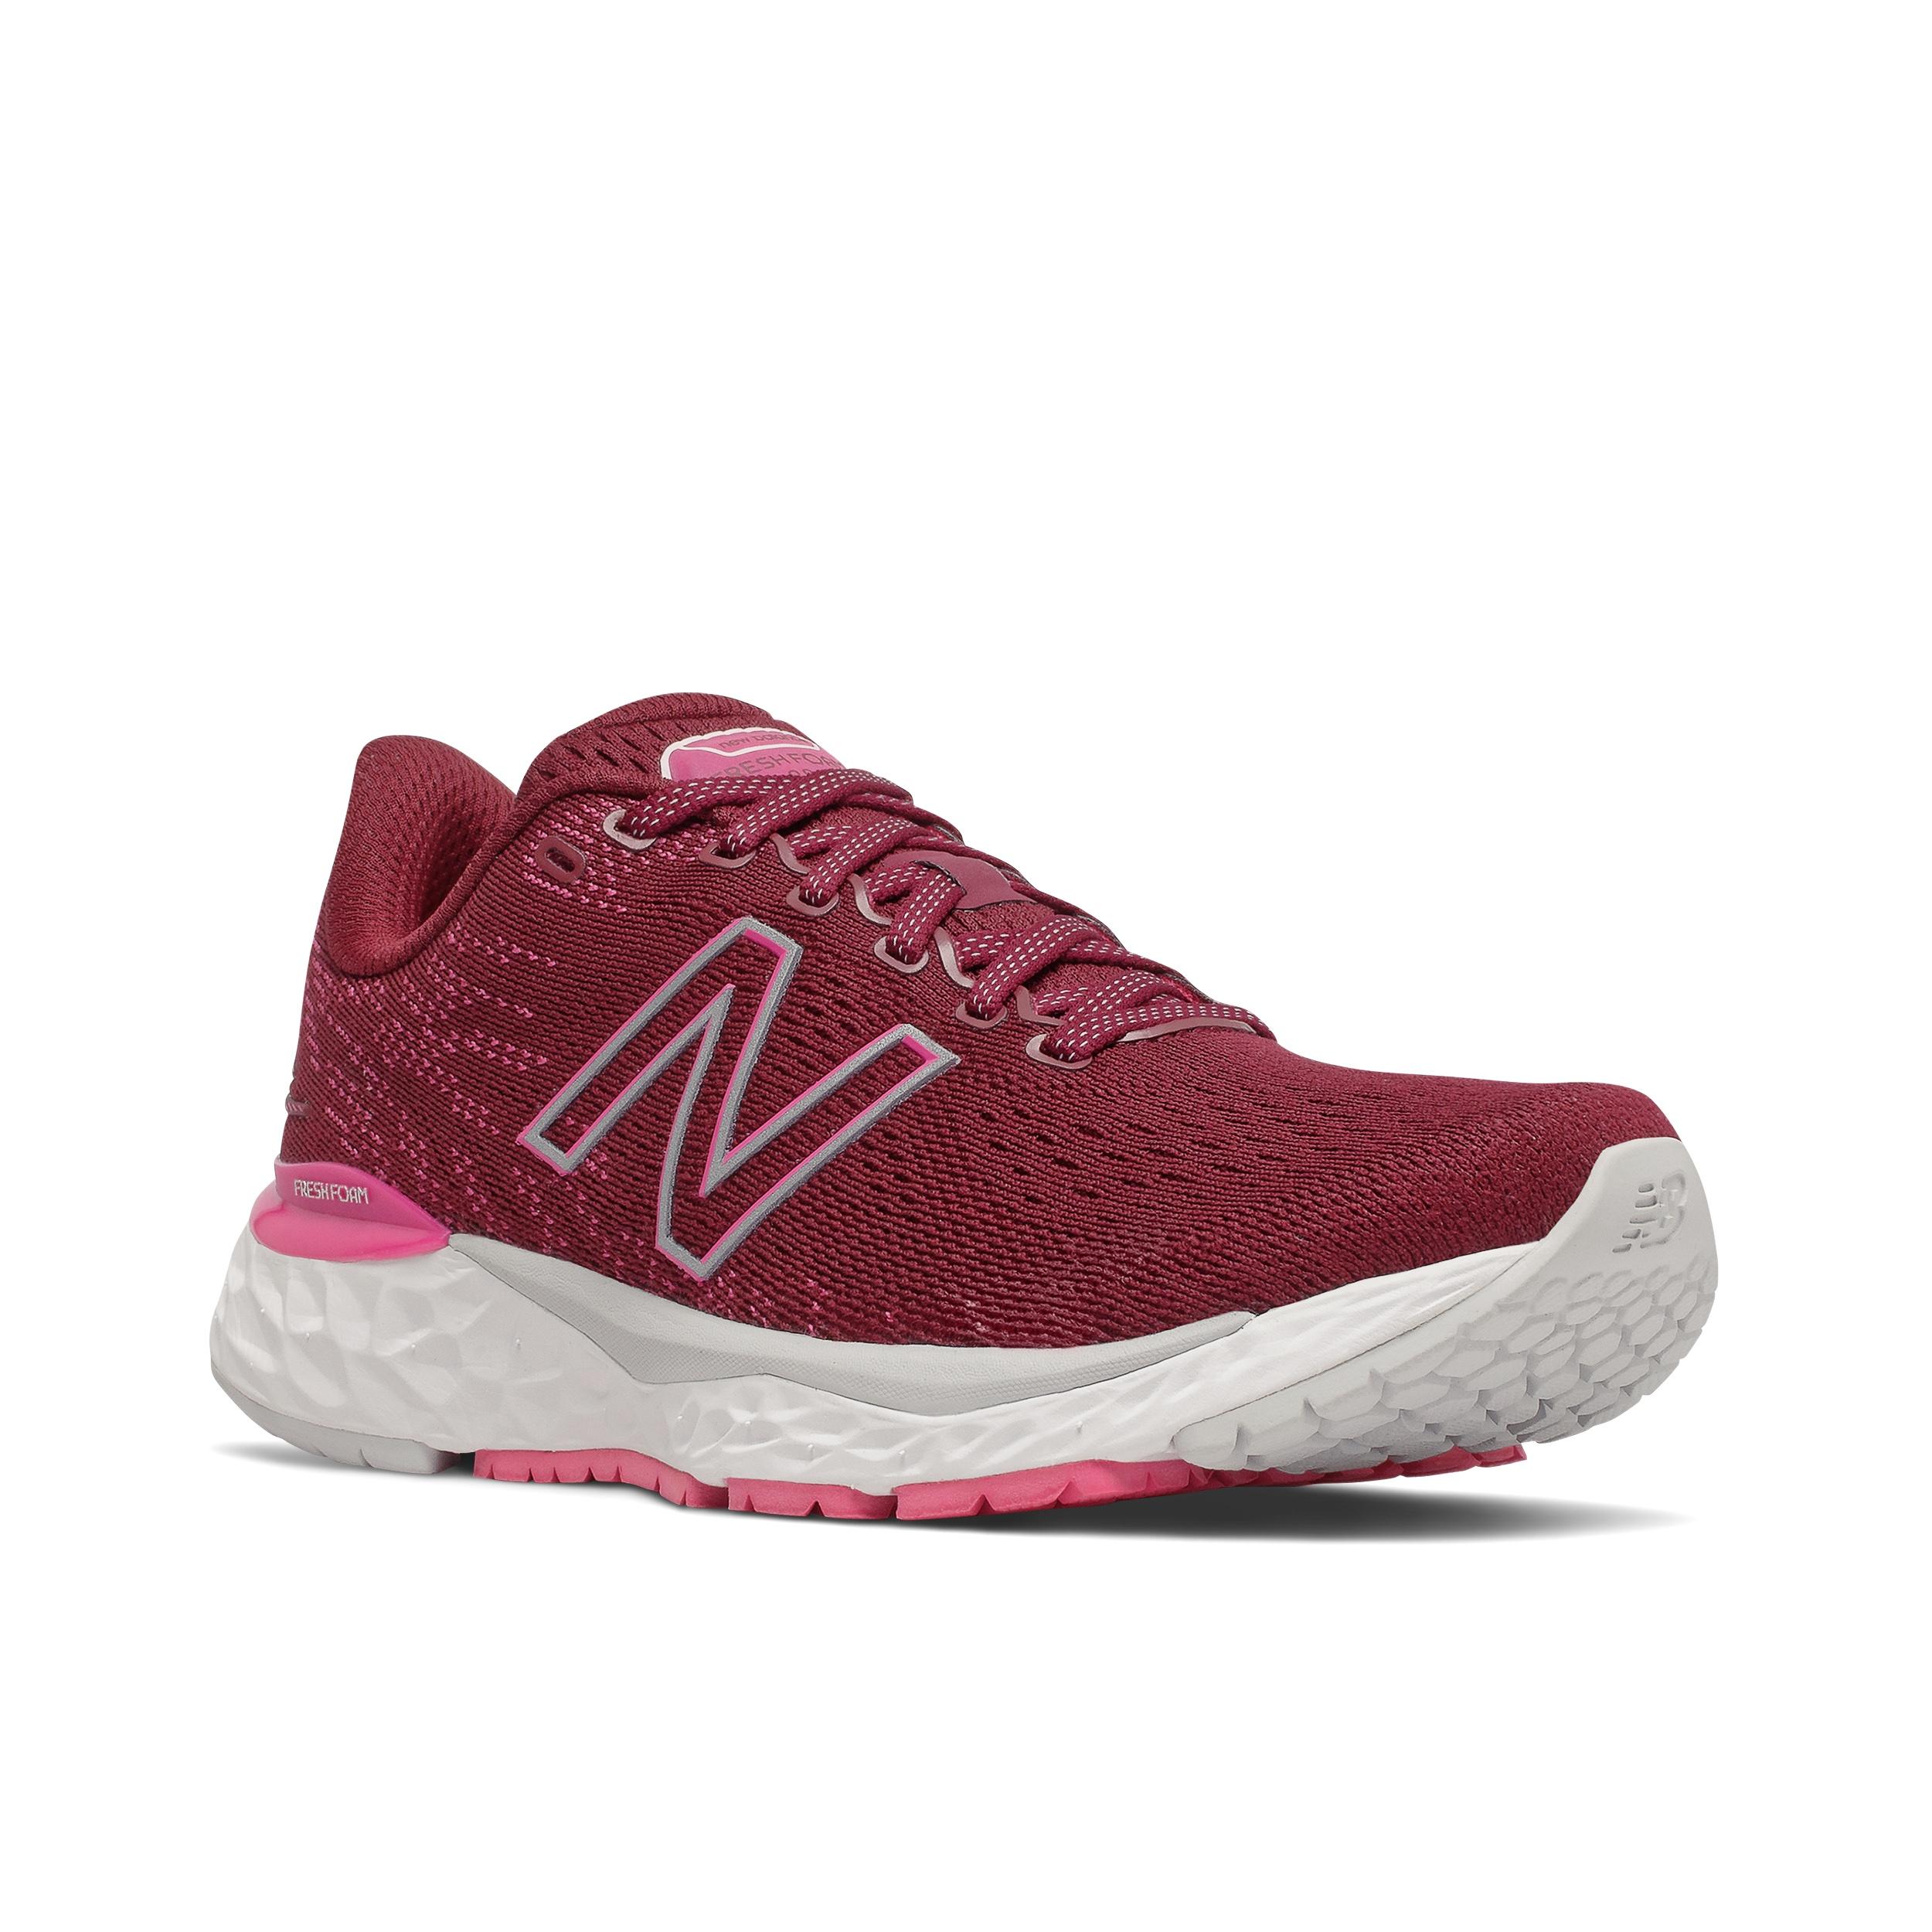 Women's New Balance 880V11 Running Shoe - Color: Garnet/Pink Glo - Size: 5 - Width: Narrow, Garnet/Pink Glo, large, image 4